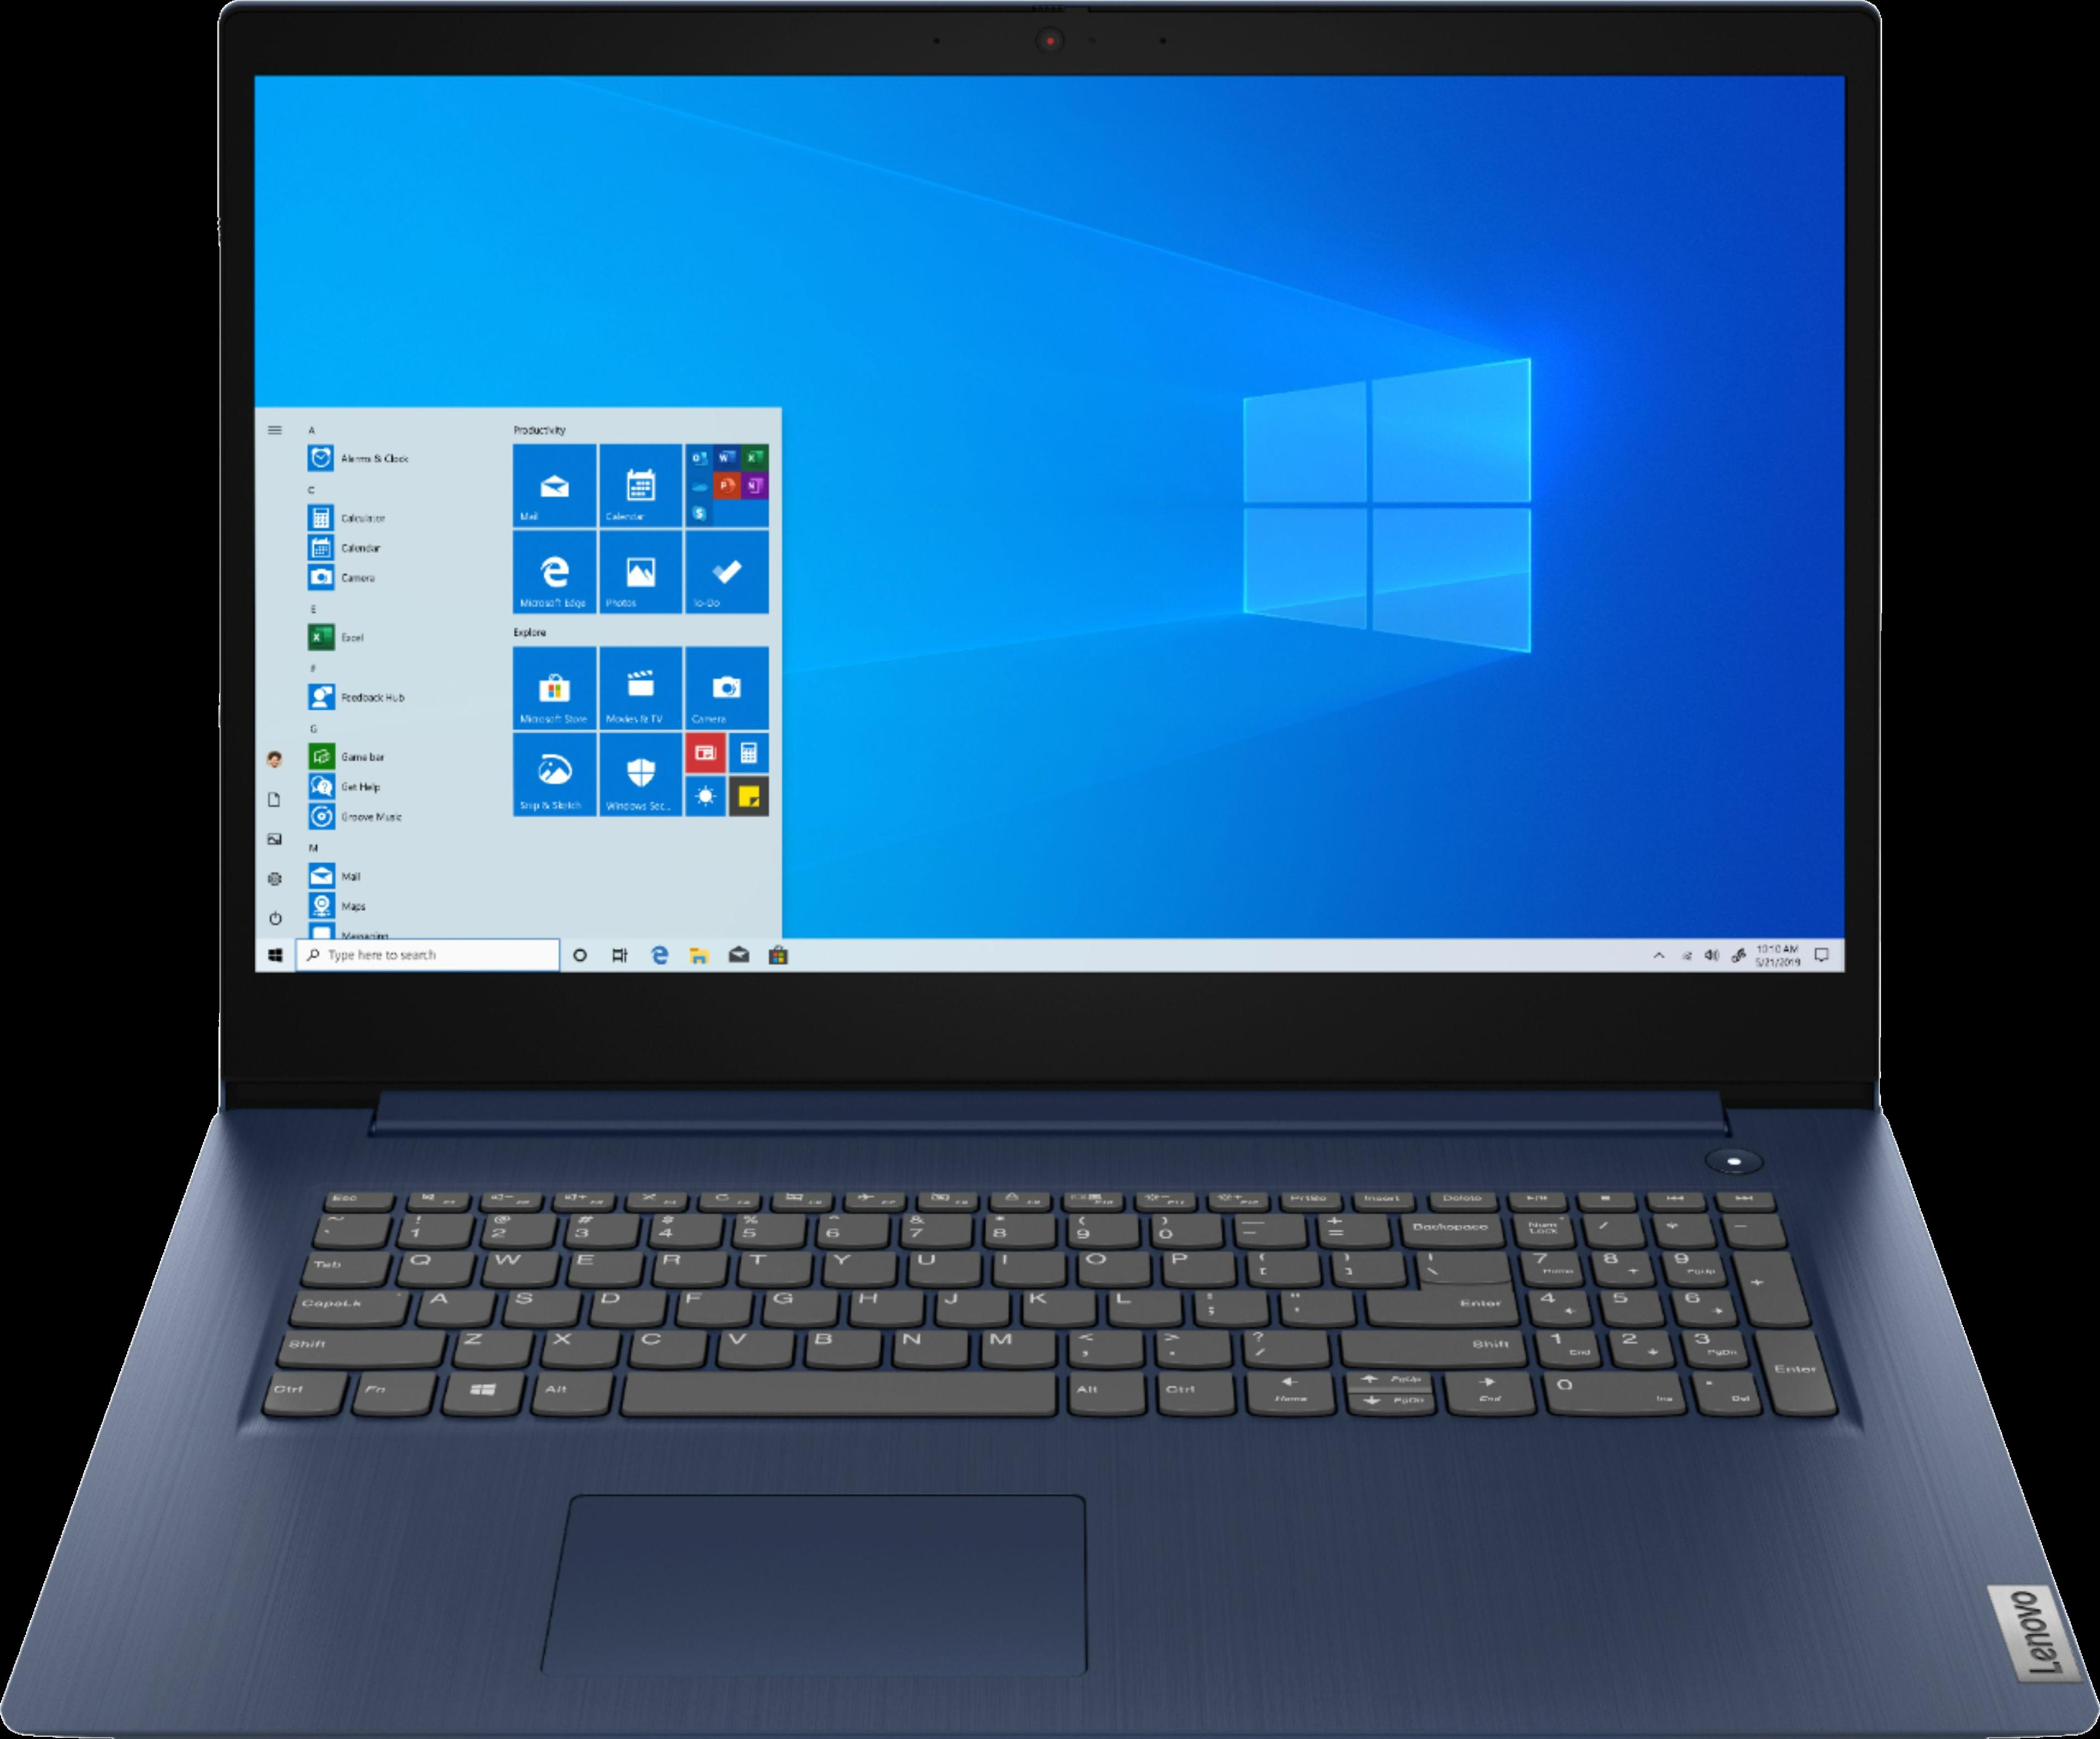 Lenovo Ideapad 3 17 Laptop - Intel Core i5 - 8GB Memory - 1TB HDD